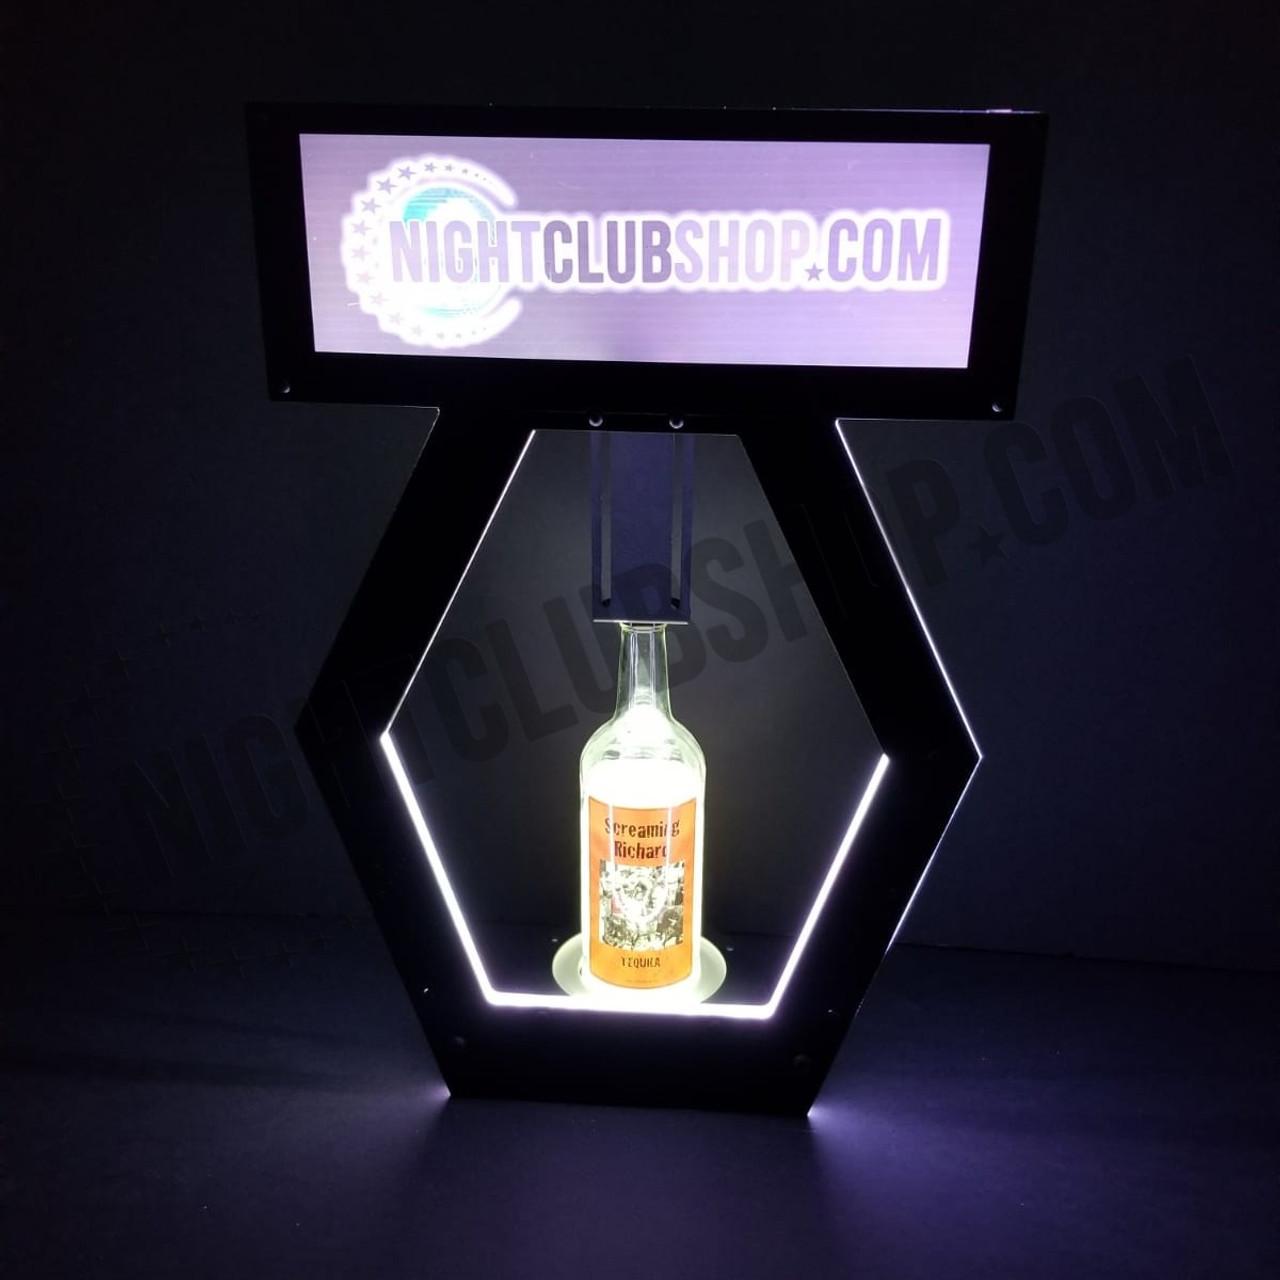 LED, VIP, Banner, Top, Custom, Print, Interchangeable, Nightclubshop, DMXR, RF, Remote, Controlled